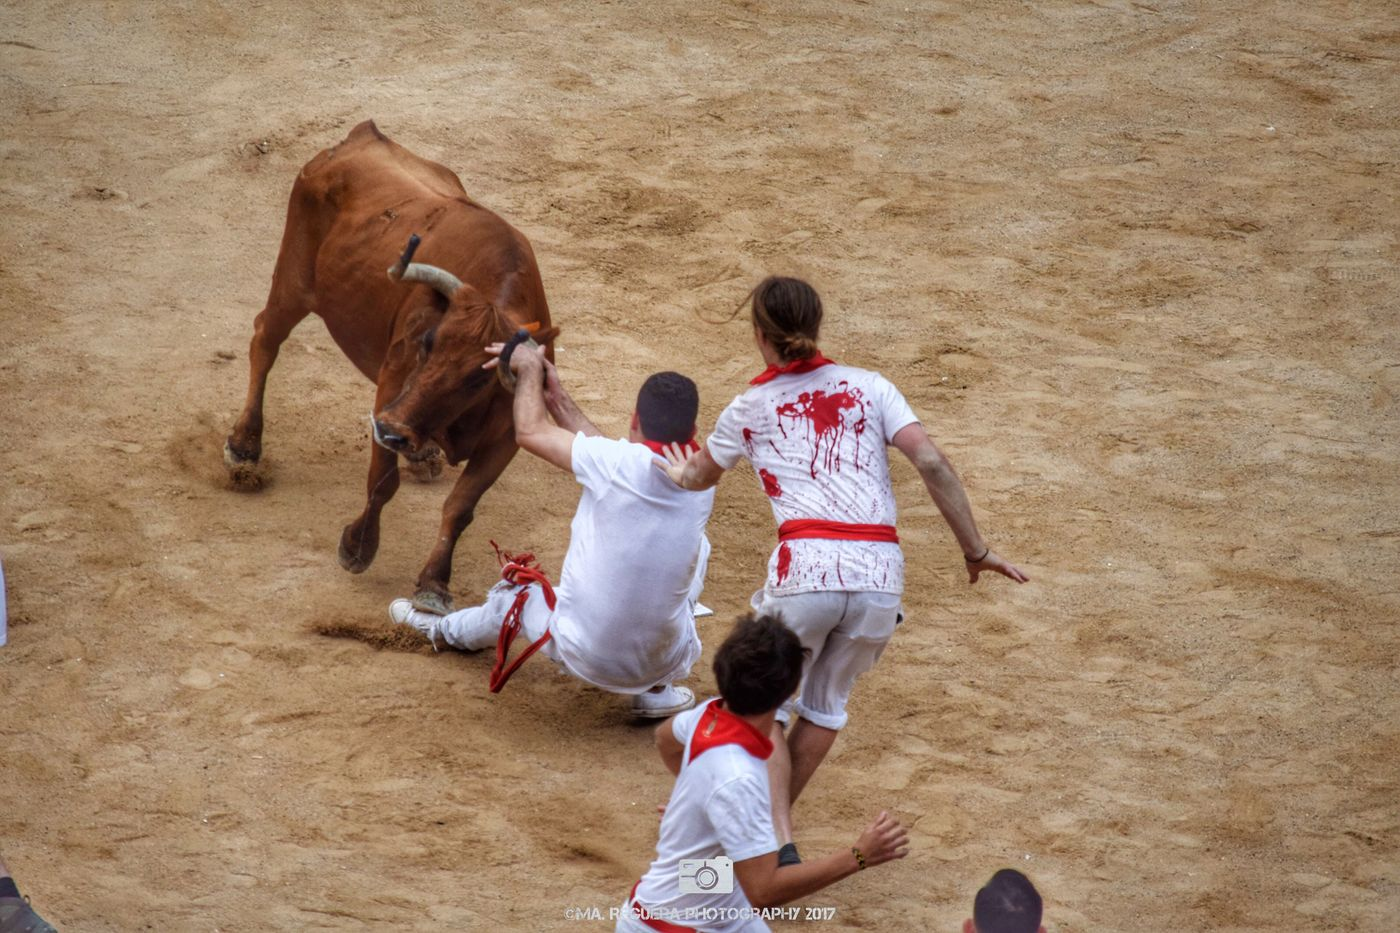 La lucha Party San Fermin Pamplona City Navarra Pamplona Bullring Bullfighter Animal Bull Group Of People People Man Fight Courage Value Action Sand